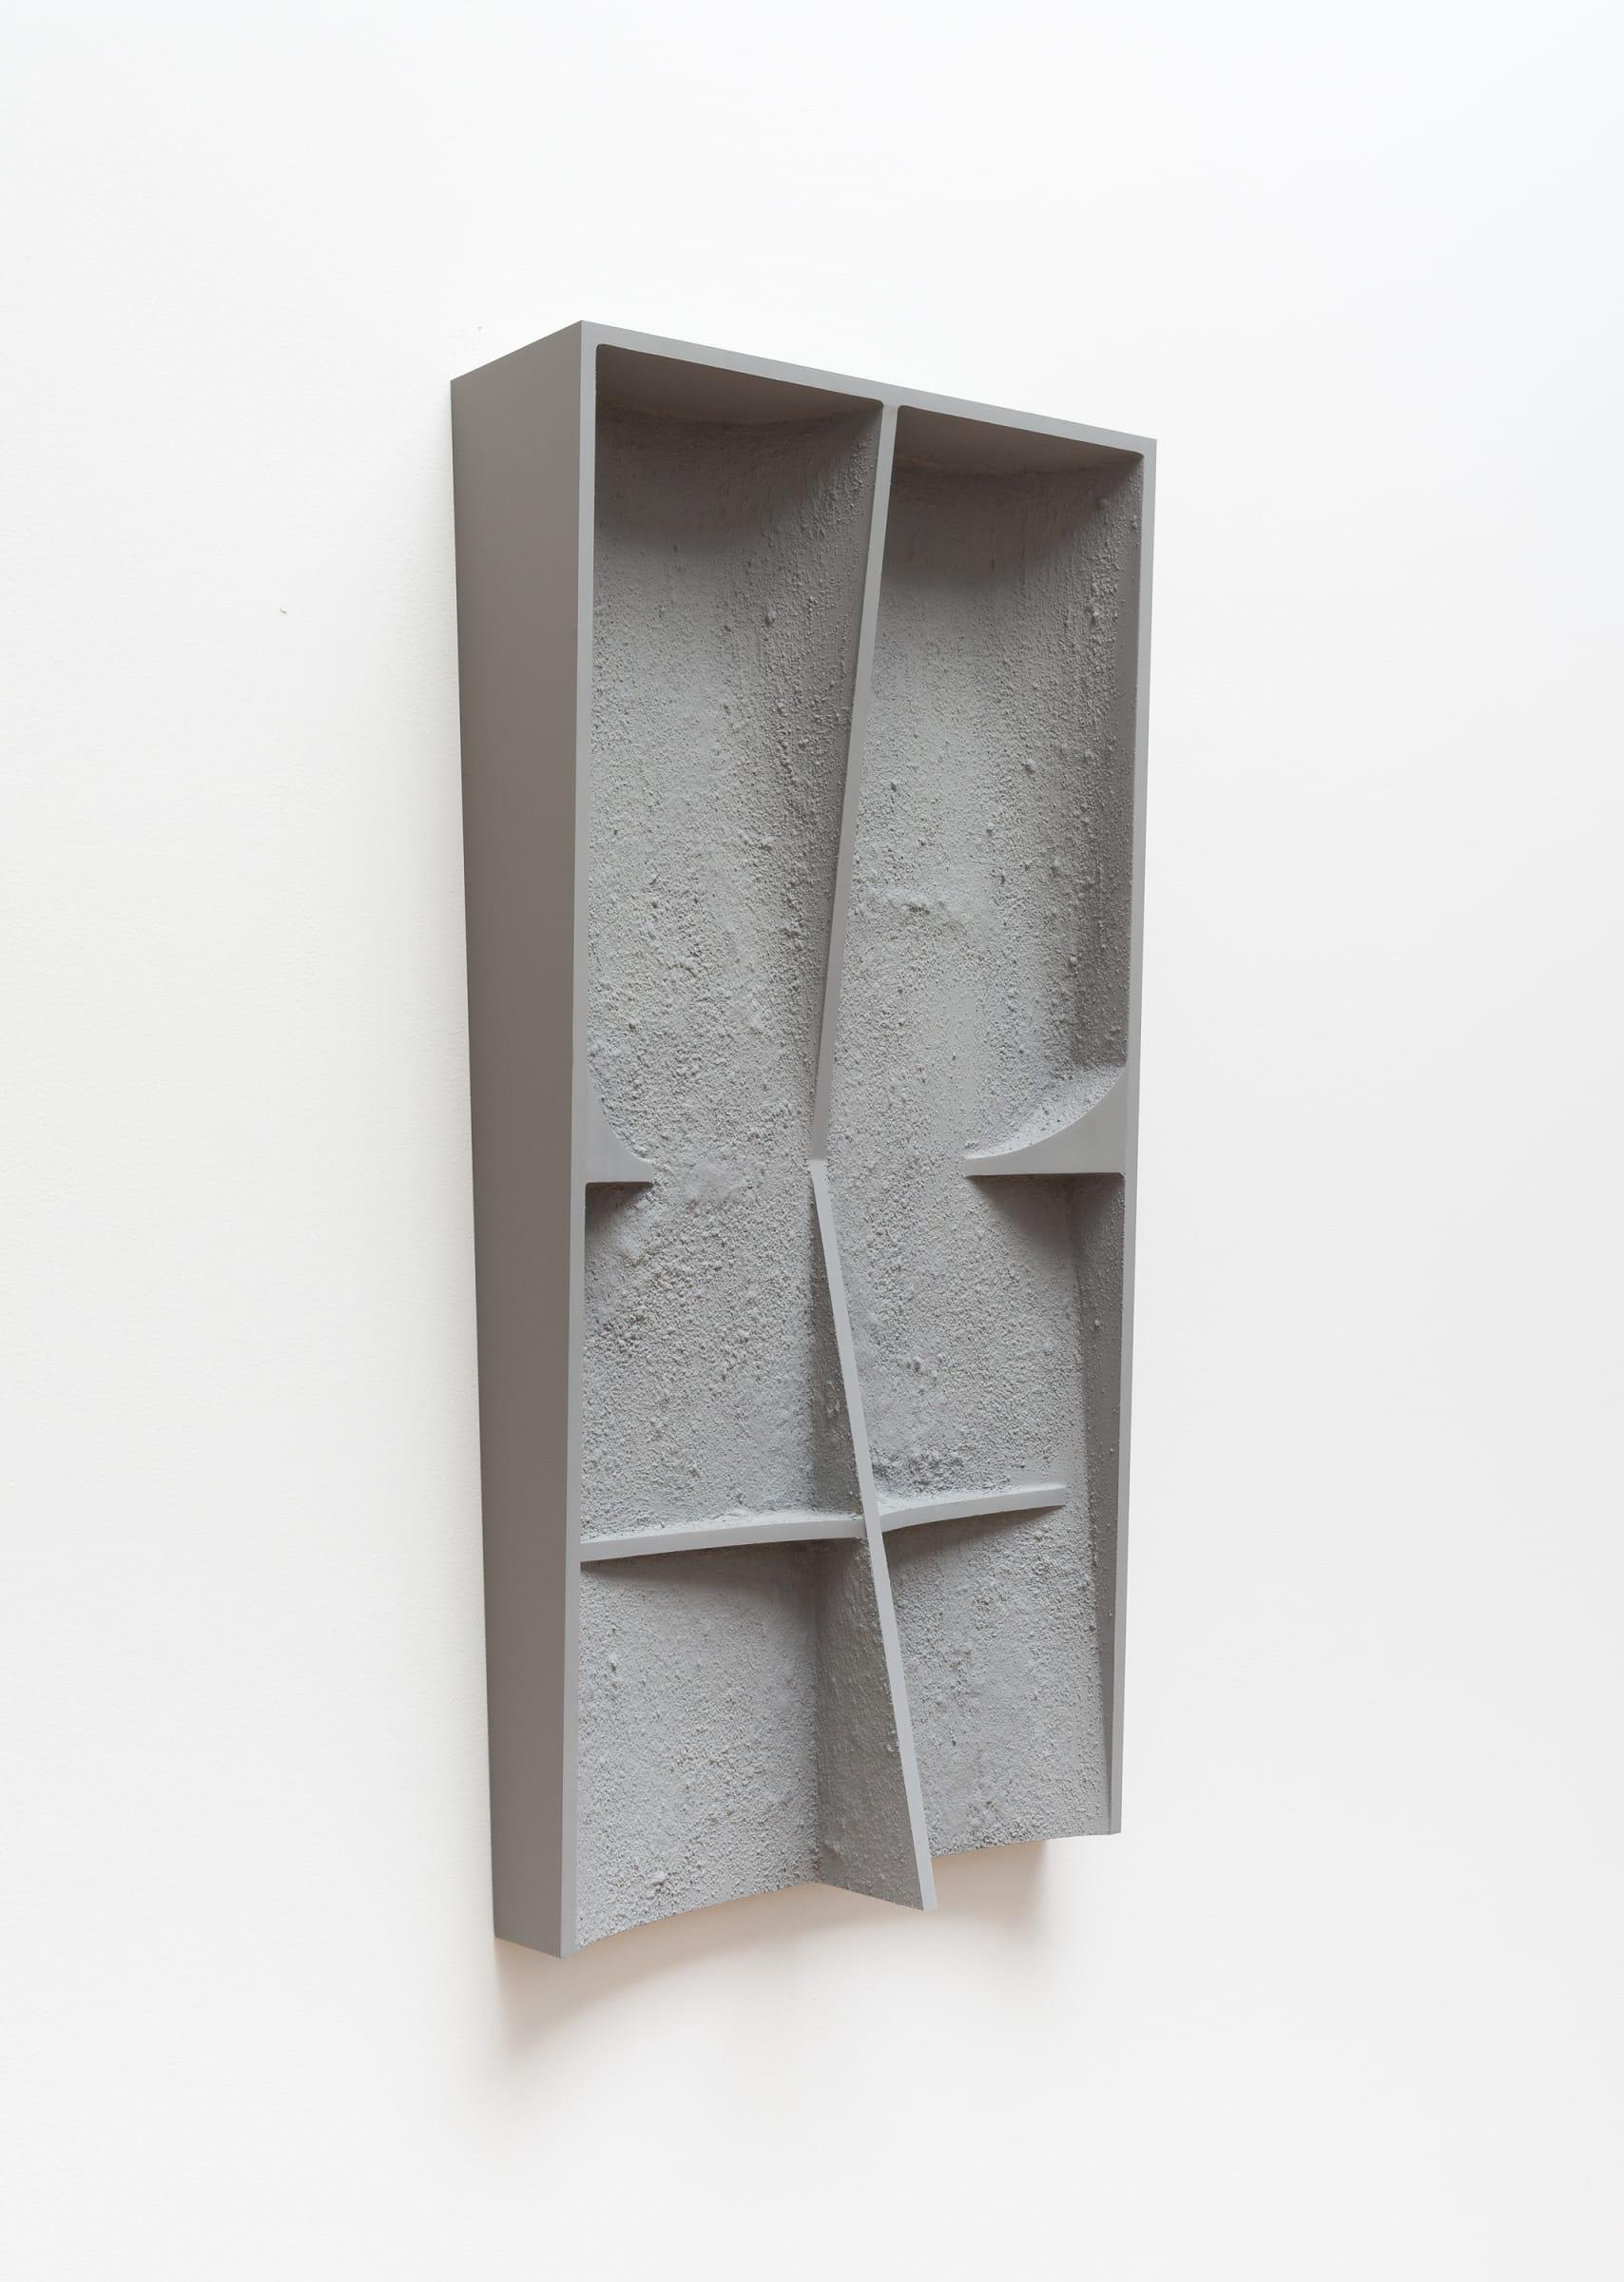 "<span class=""link fancybox-details-link""><a href=""/exhibitions/166/works/artworks15365/"">View Detail Page</a></span><div class=""artist""><strong>B. Ingrid Olson</strong></div><div class=""title""><em>Future Body, plastic drawing</em>, 2017</div><div class=""medium"">PVA size, acrylic, vinyl paint and sand on polyurethane foam</div><div class=""dimensions"">76,2 x 38,1 x 11,43 cm</div>"